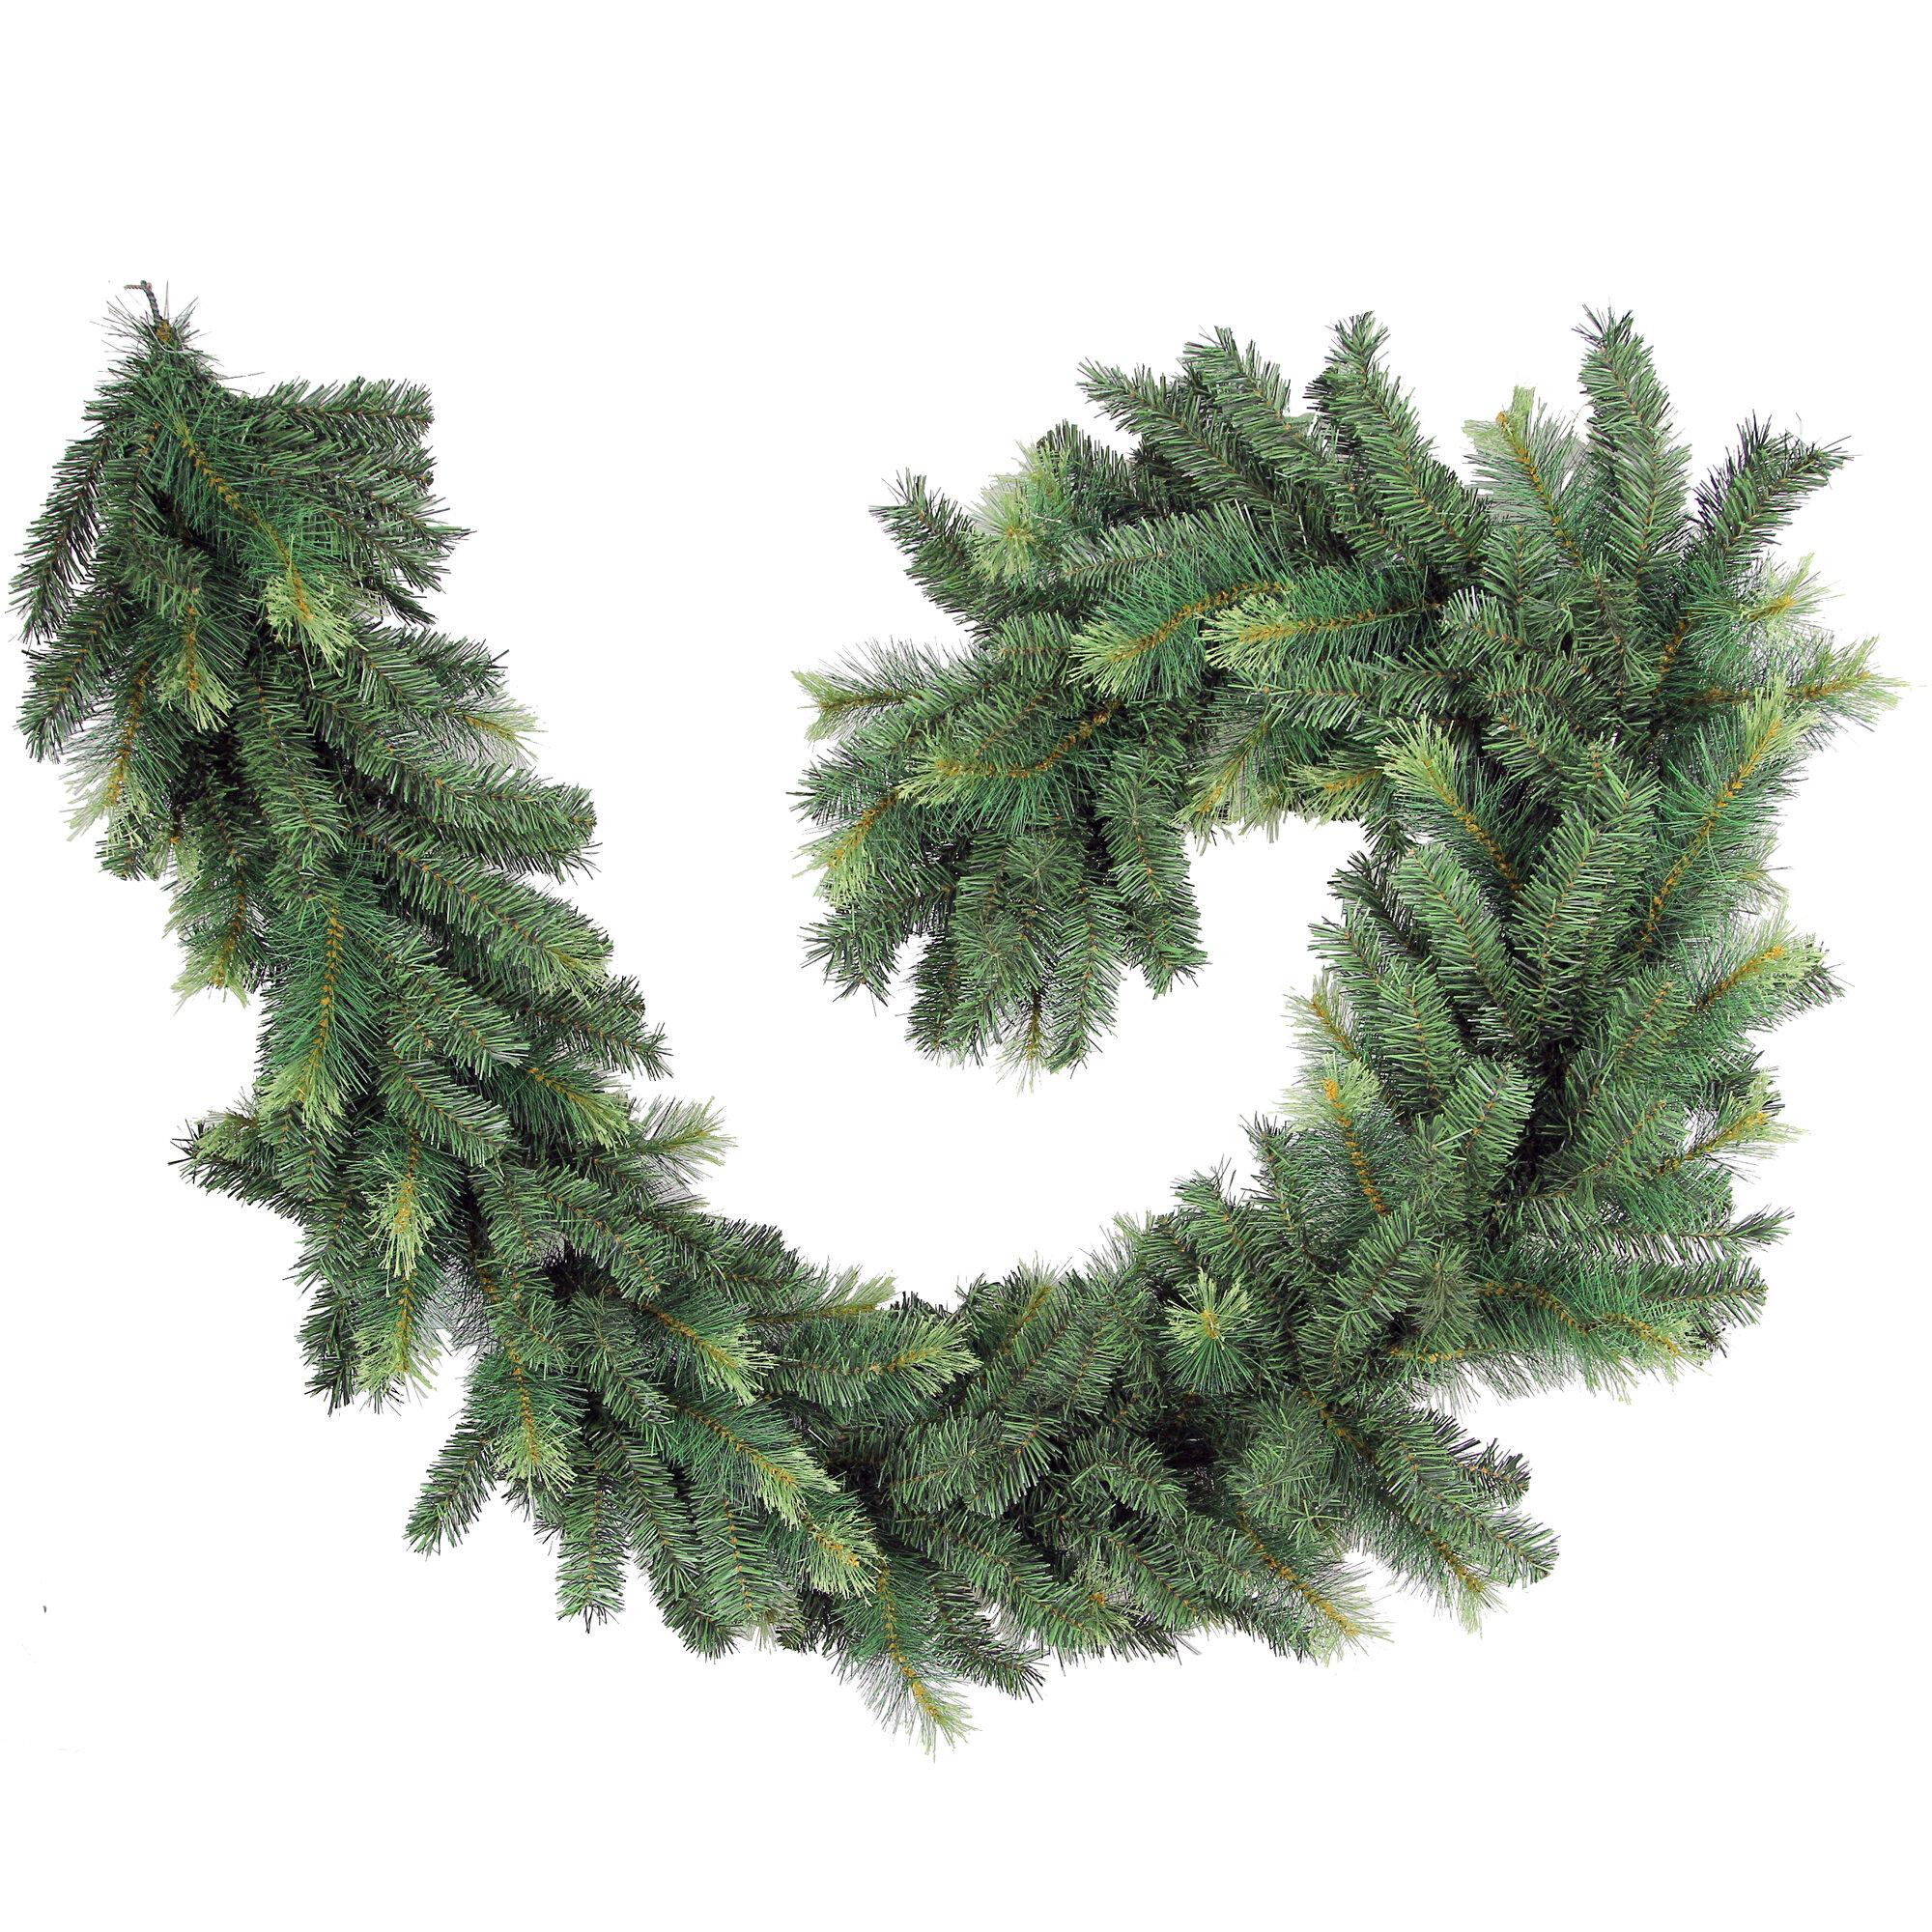 Christmas Pine Garland.Christmas Pine Garland